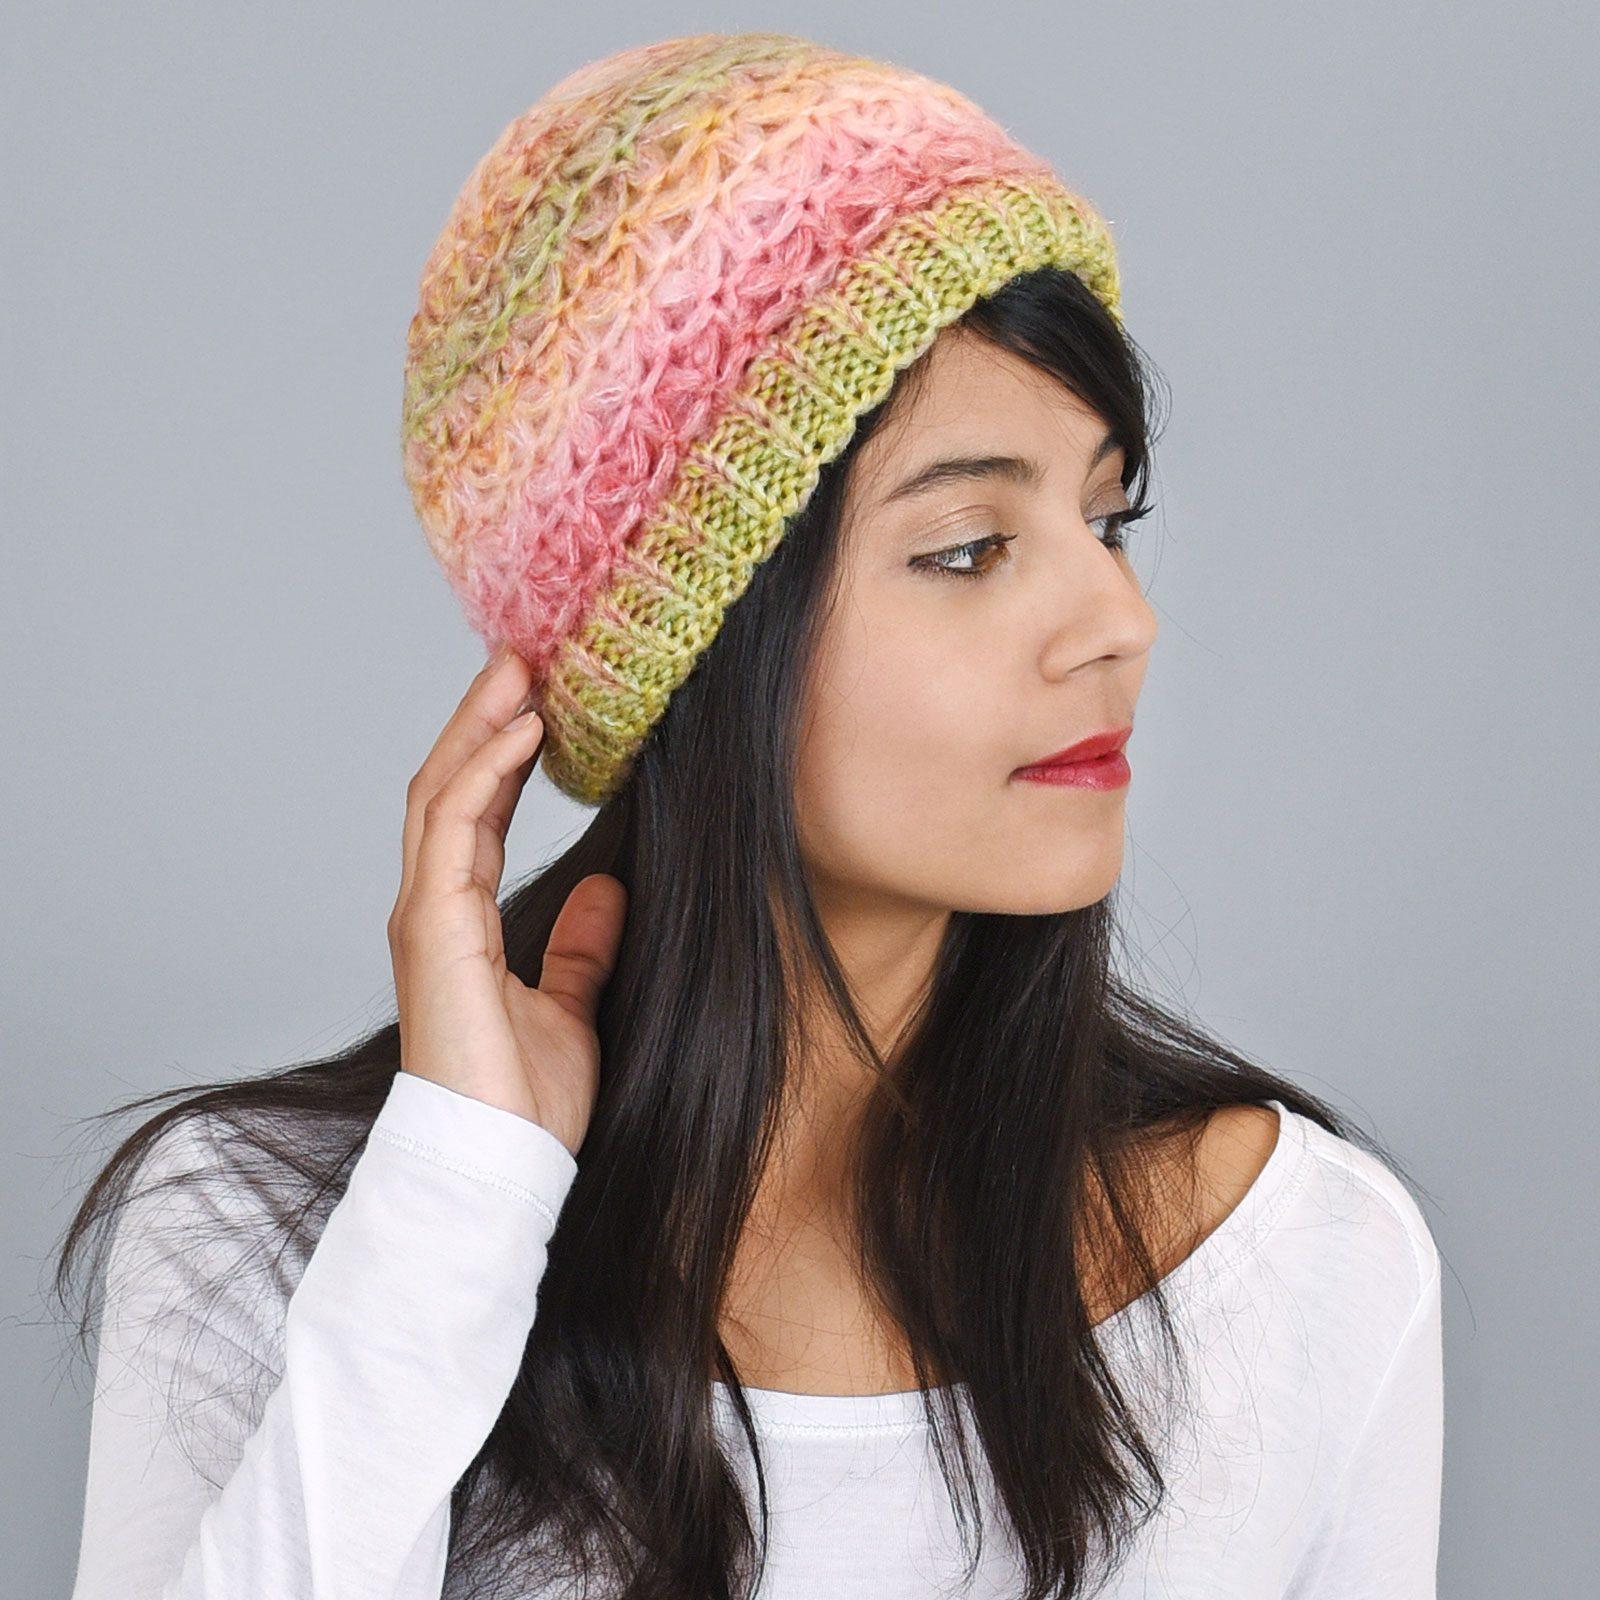 http://lookbook.allee-du-foulard.fr/wp-content/uploads/2019/01/CP-00818-VF16-bonnet-femme-hiver-jaune-rose-1600x1600.jpg